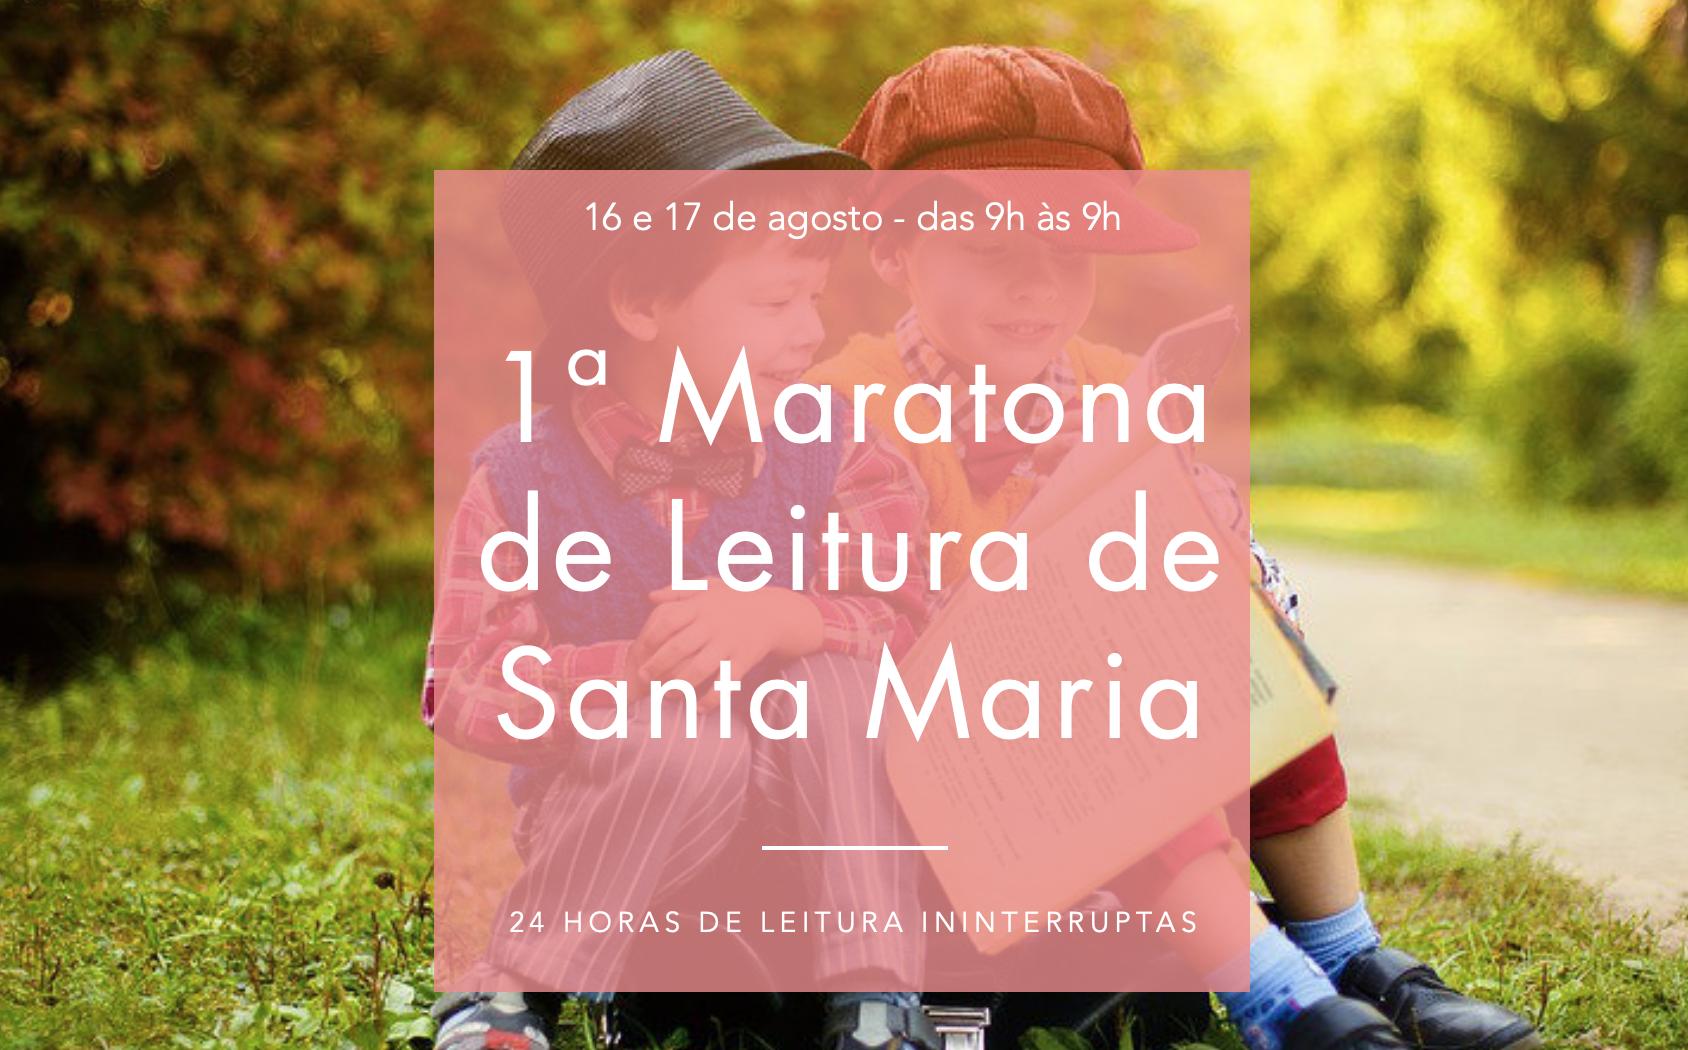 I Maratona de Leitura de Santa Maria – 24 horas de leituras ininterruptas